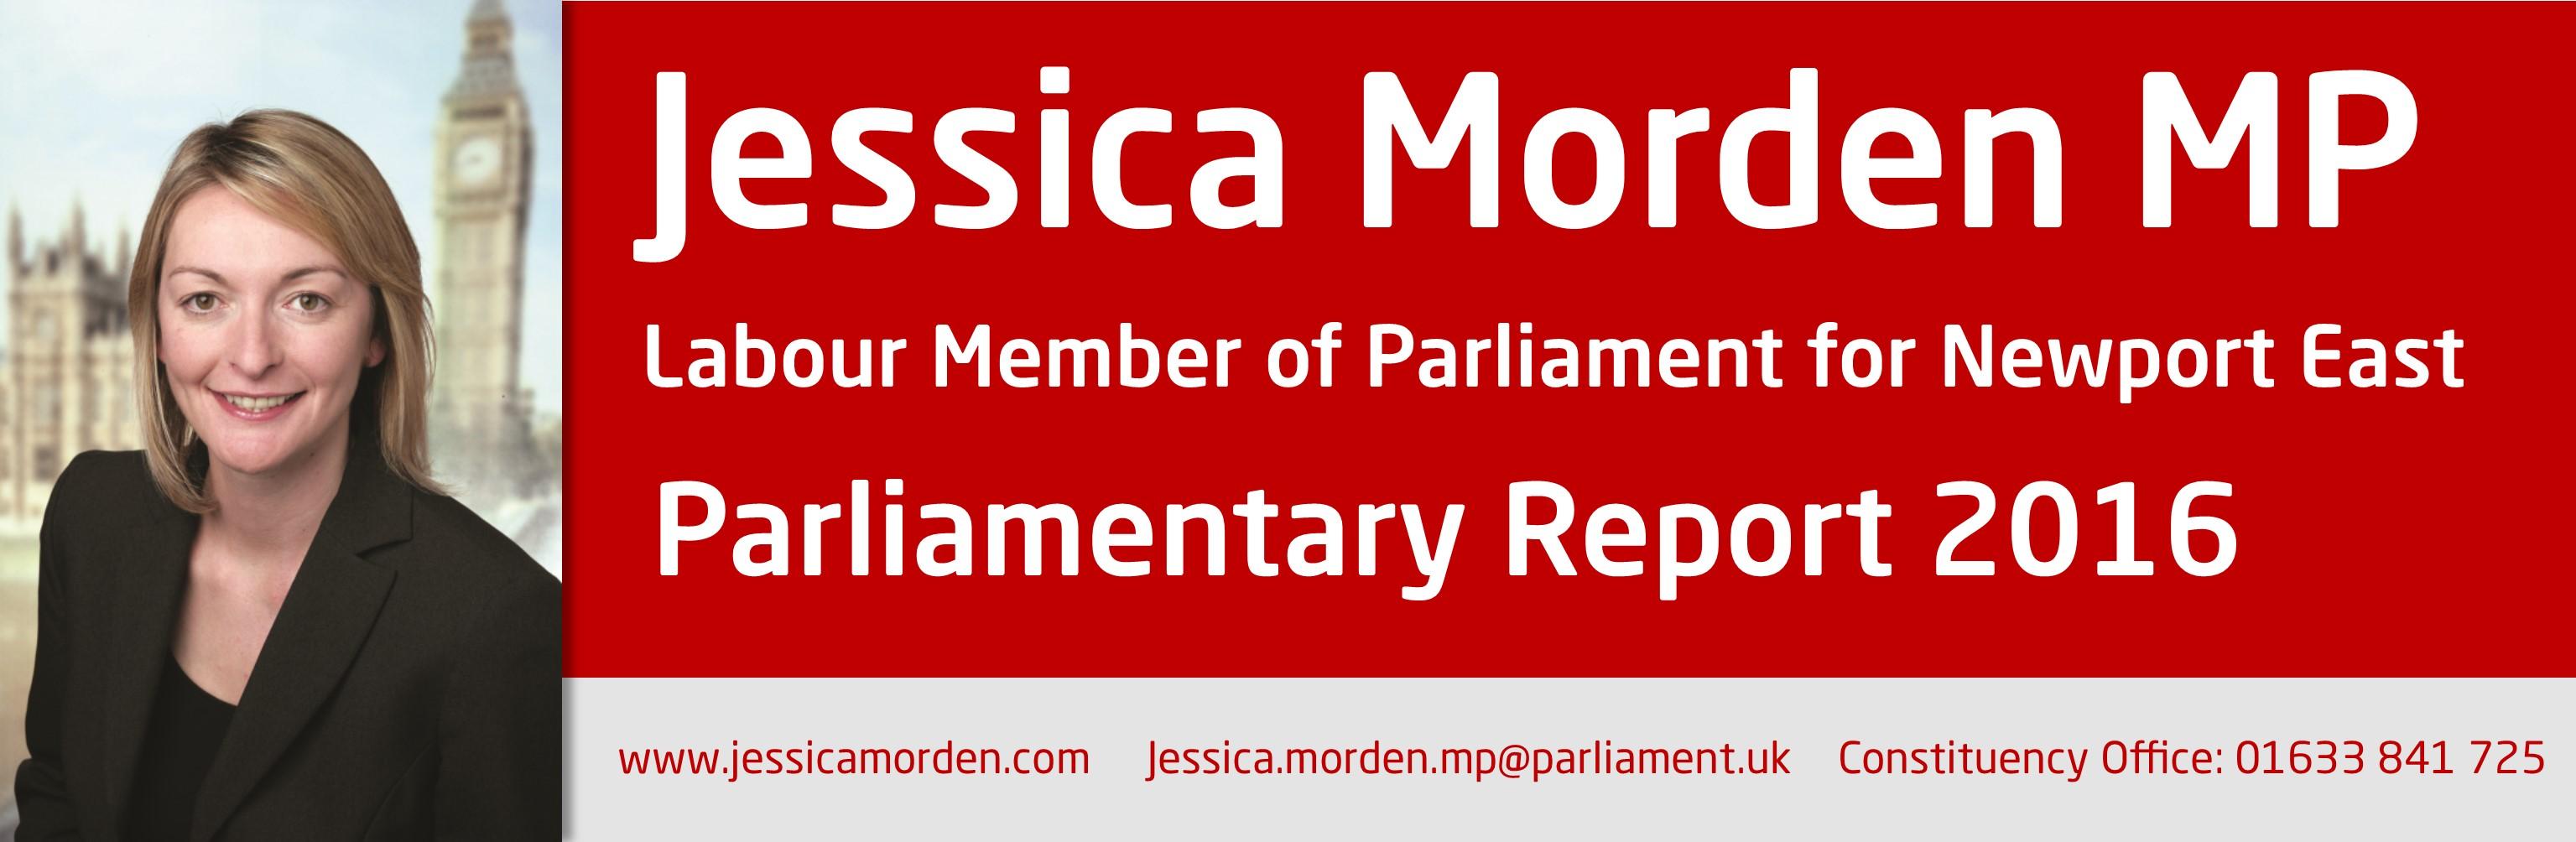 Jessica_email_header.jpg